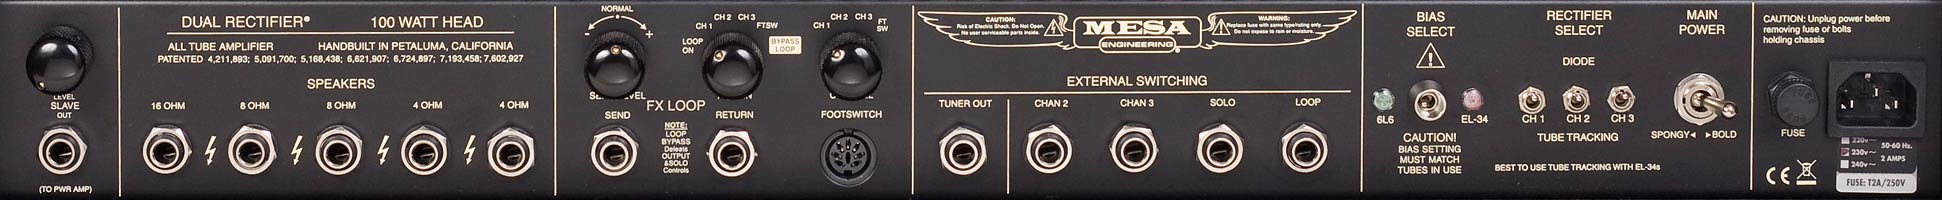 Mesa Boogie Dual rectifier Rear Panel